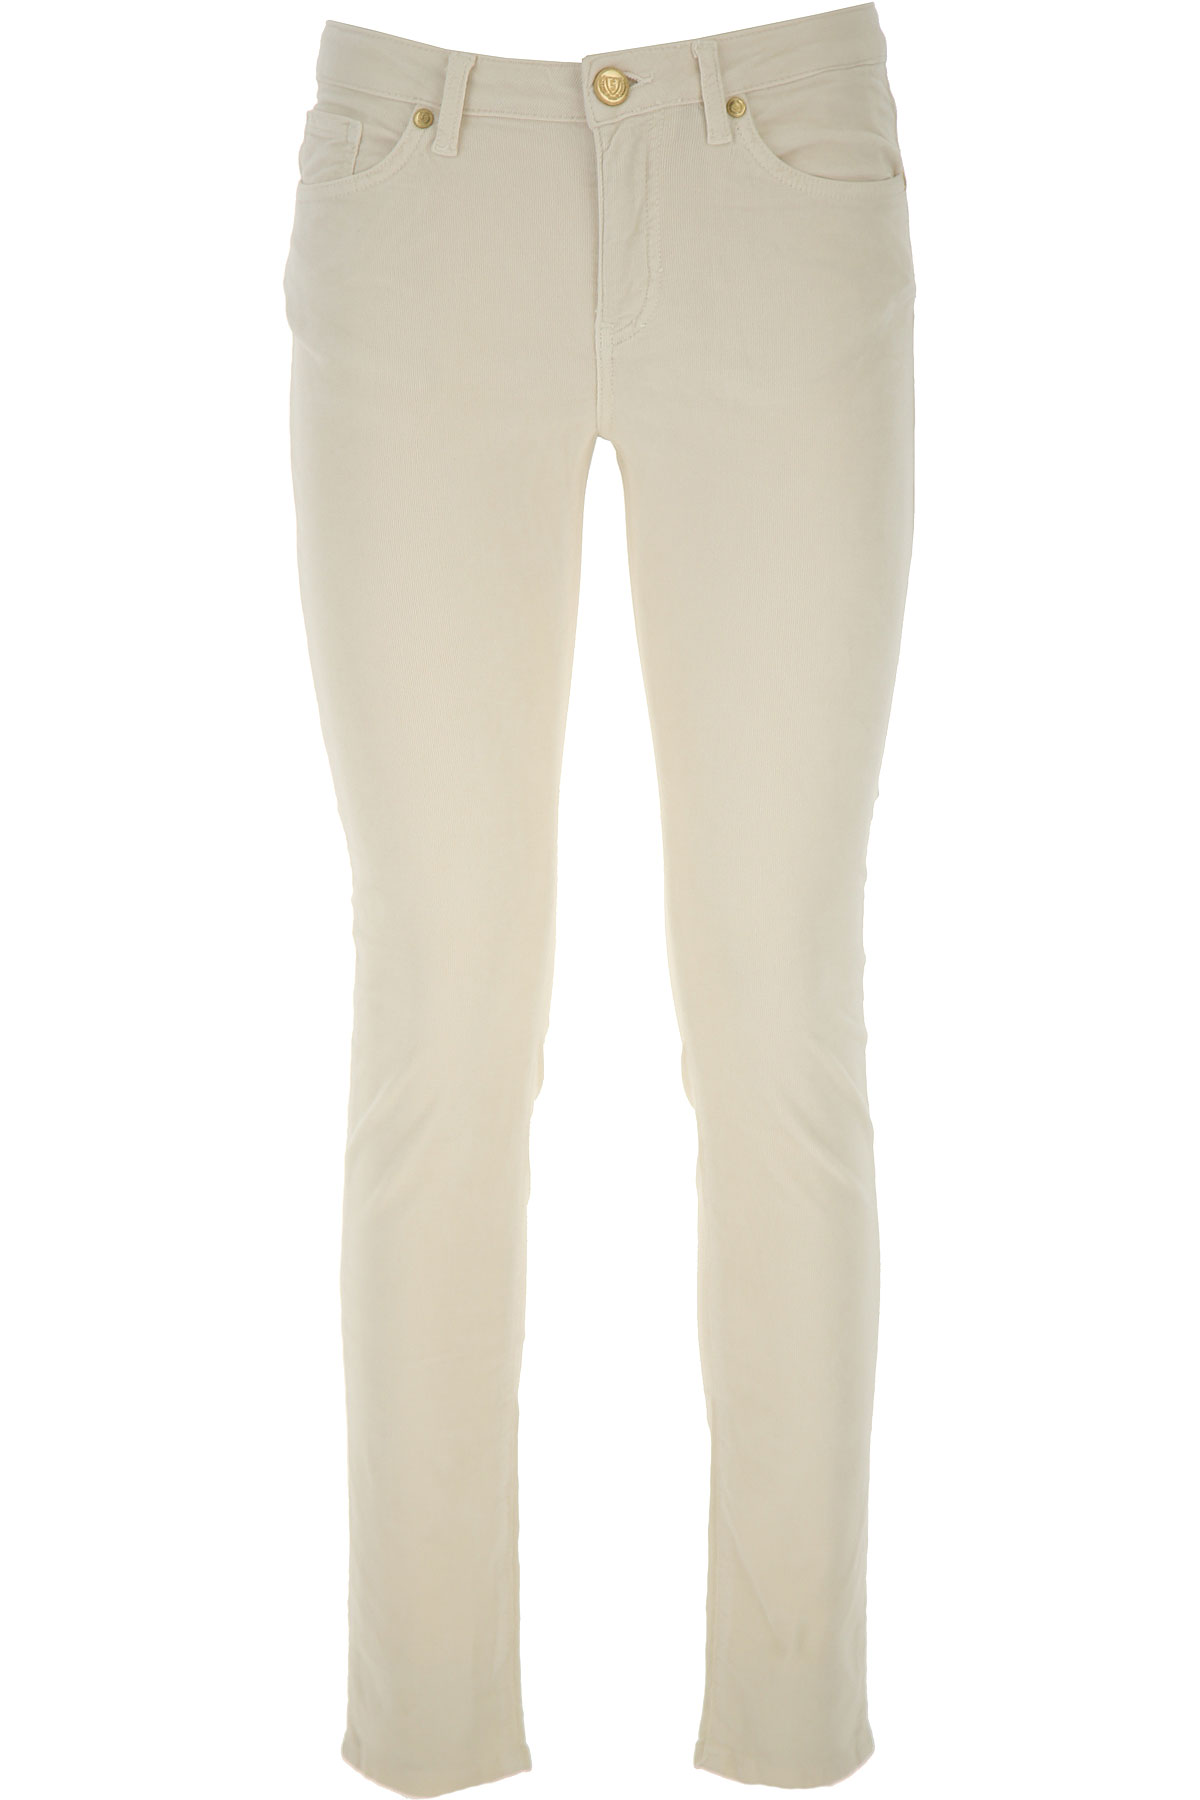 Silvian Heach Jeans On Sale, Light Cream, Cotton, 2019, 25 28 29 30